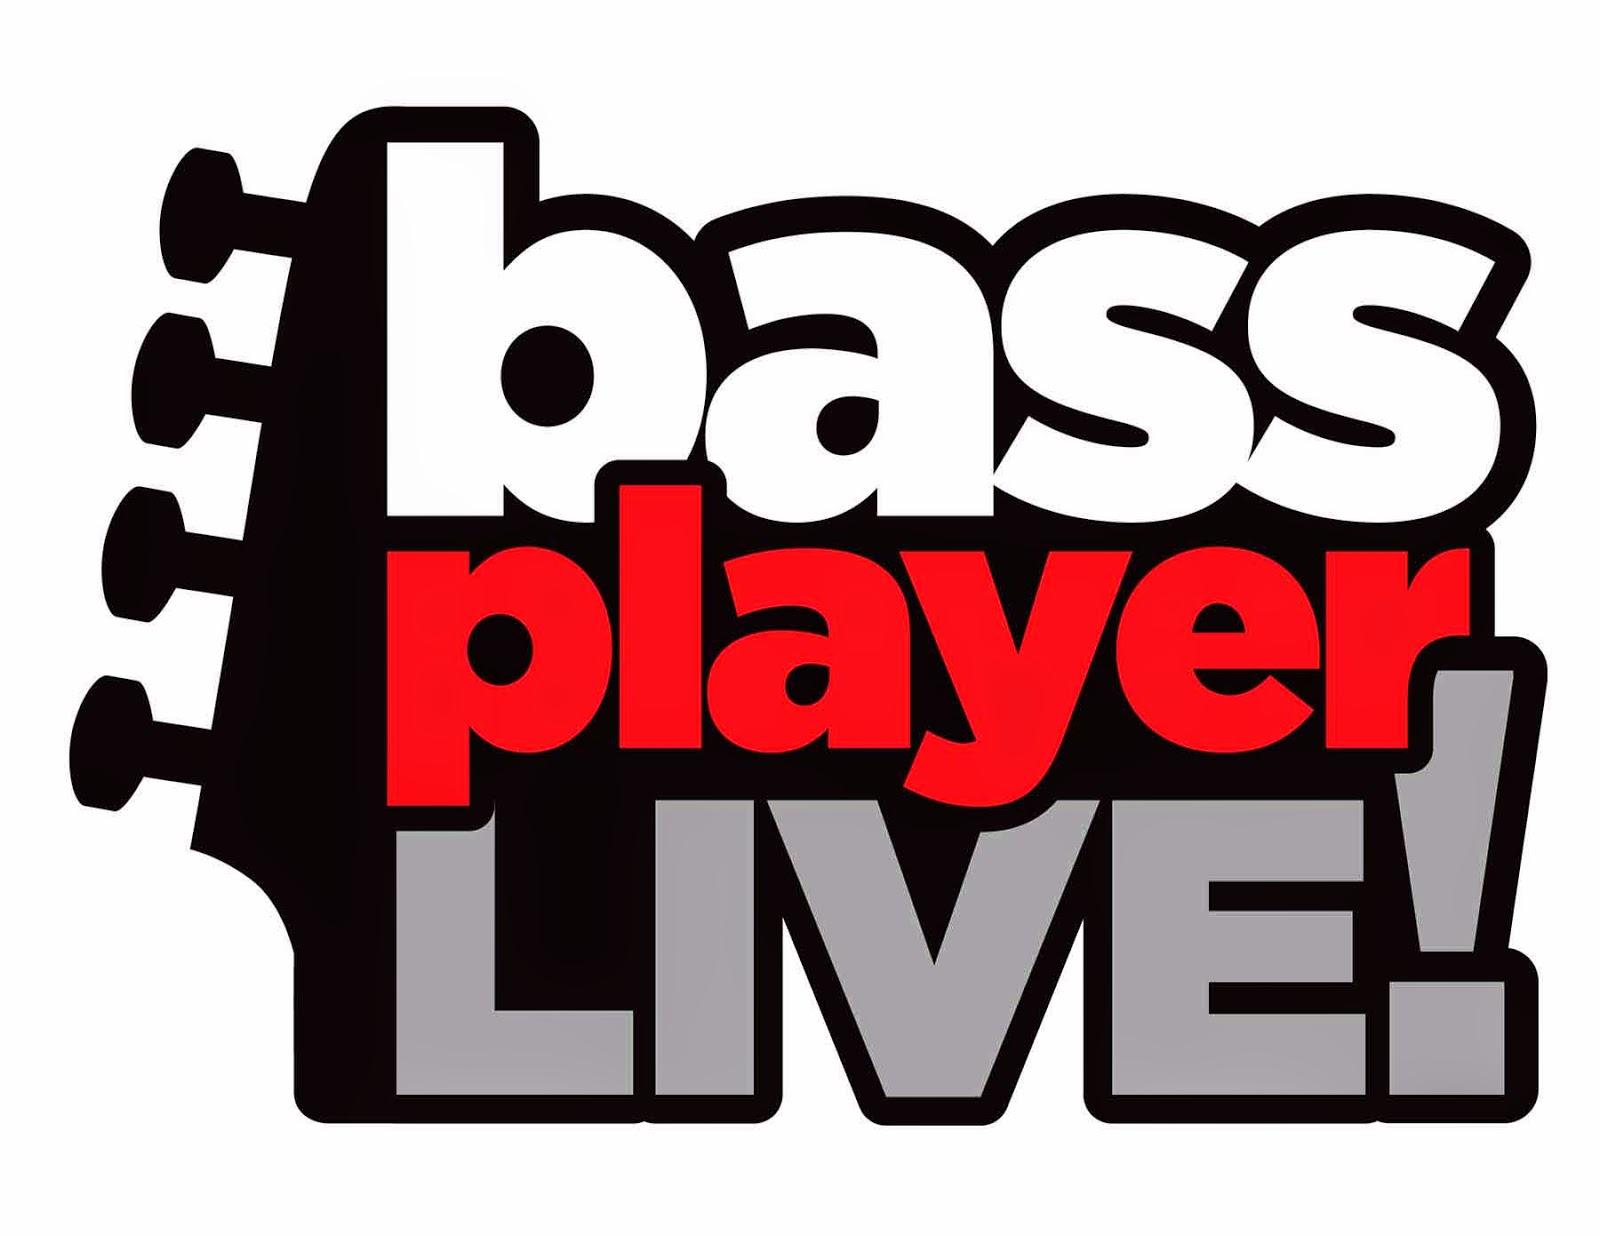 http://bassplayer.com/bplive.aspx